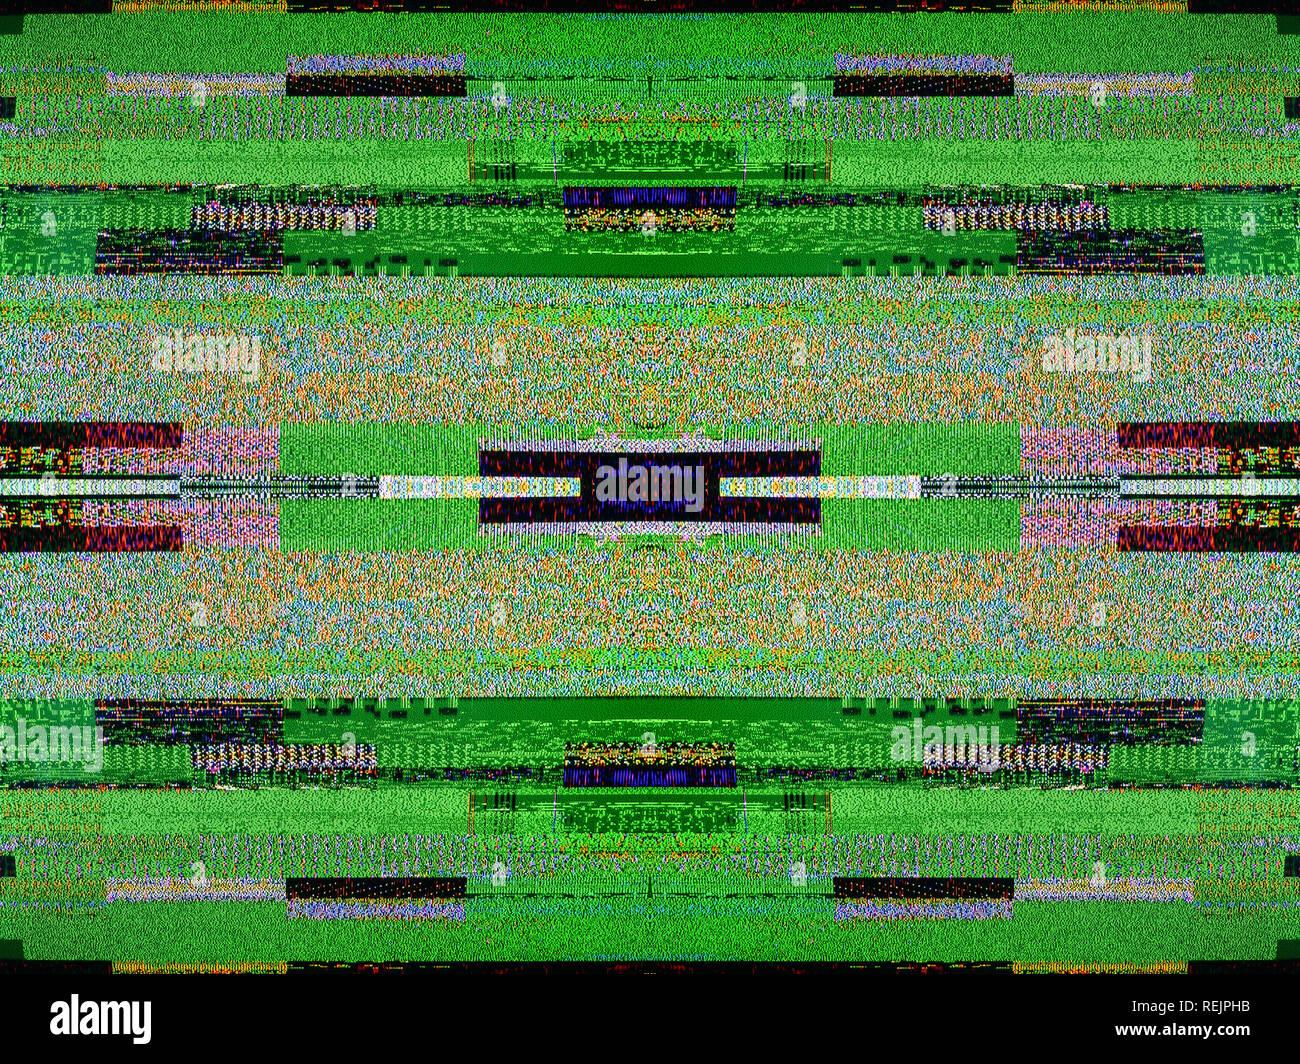 Digital television noise on a large plasma OLED 4K Ultra HD High Dynamic Range HDR Smart TV square image - Stock Image